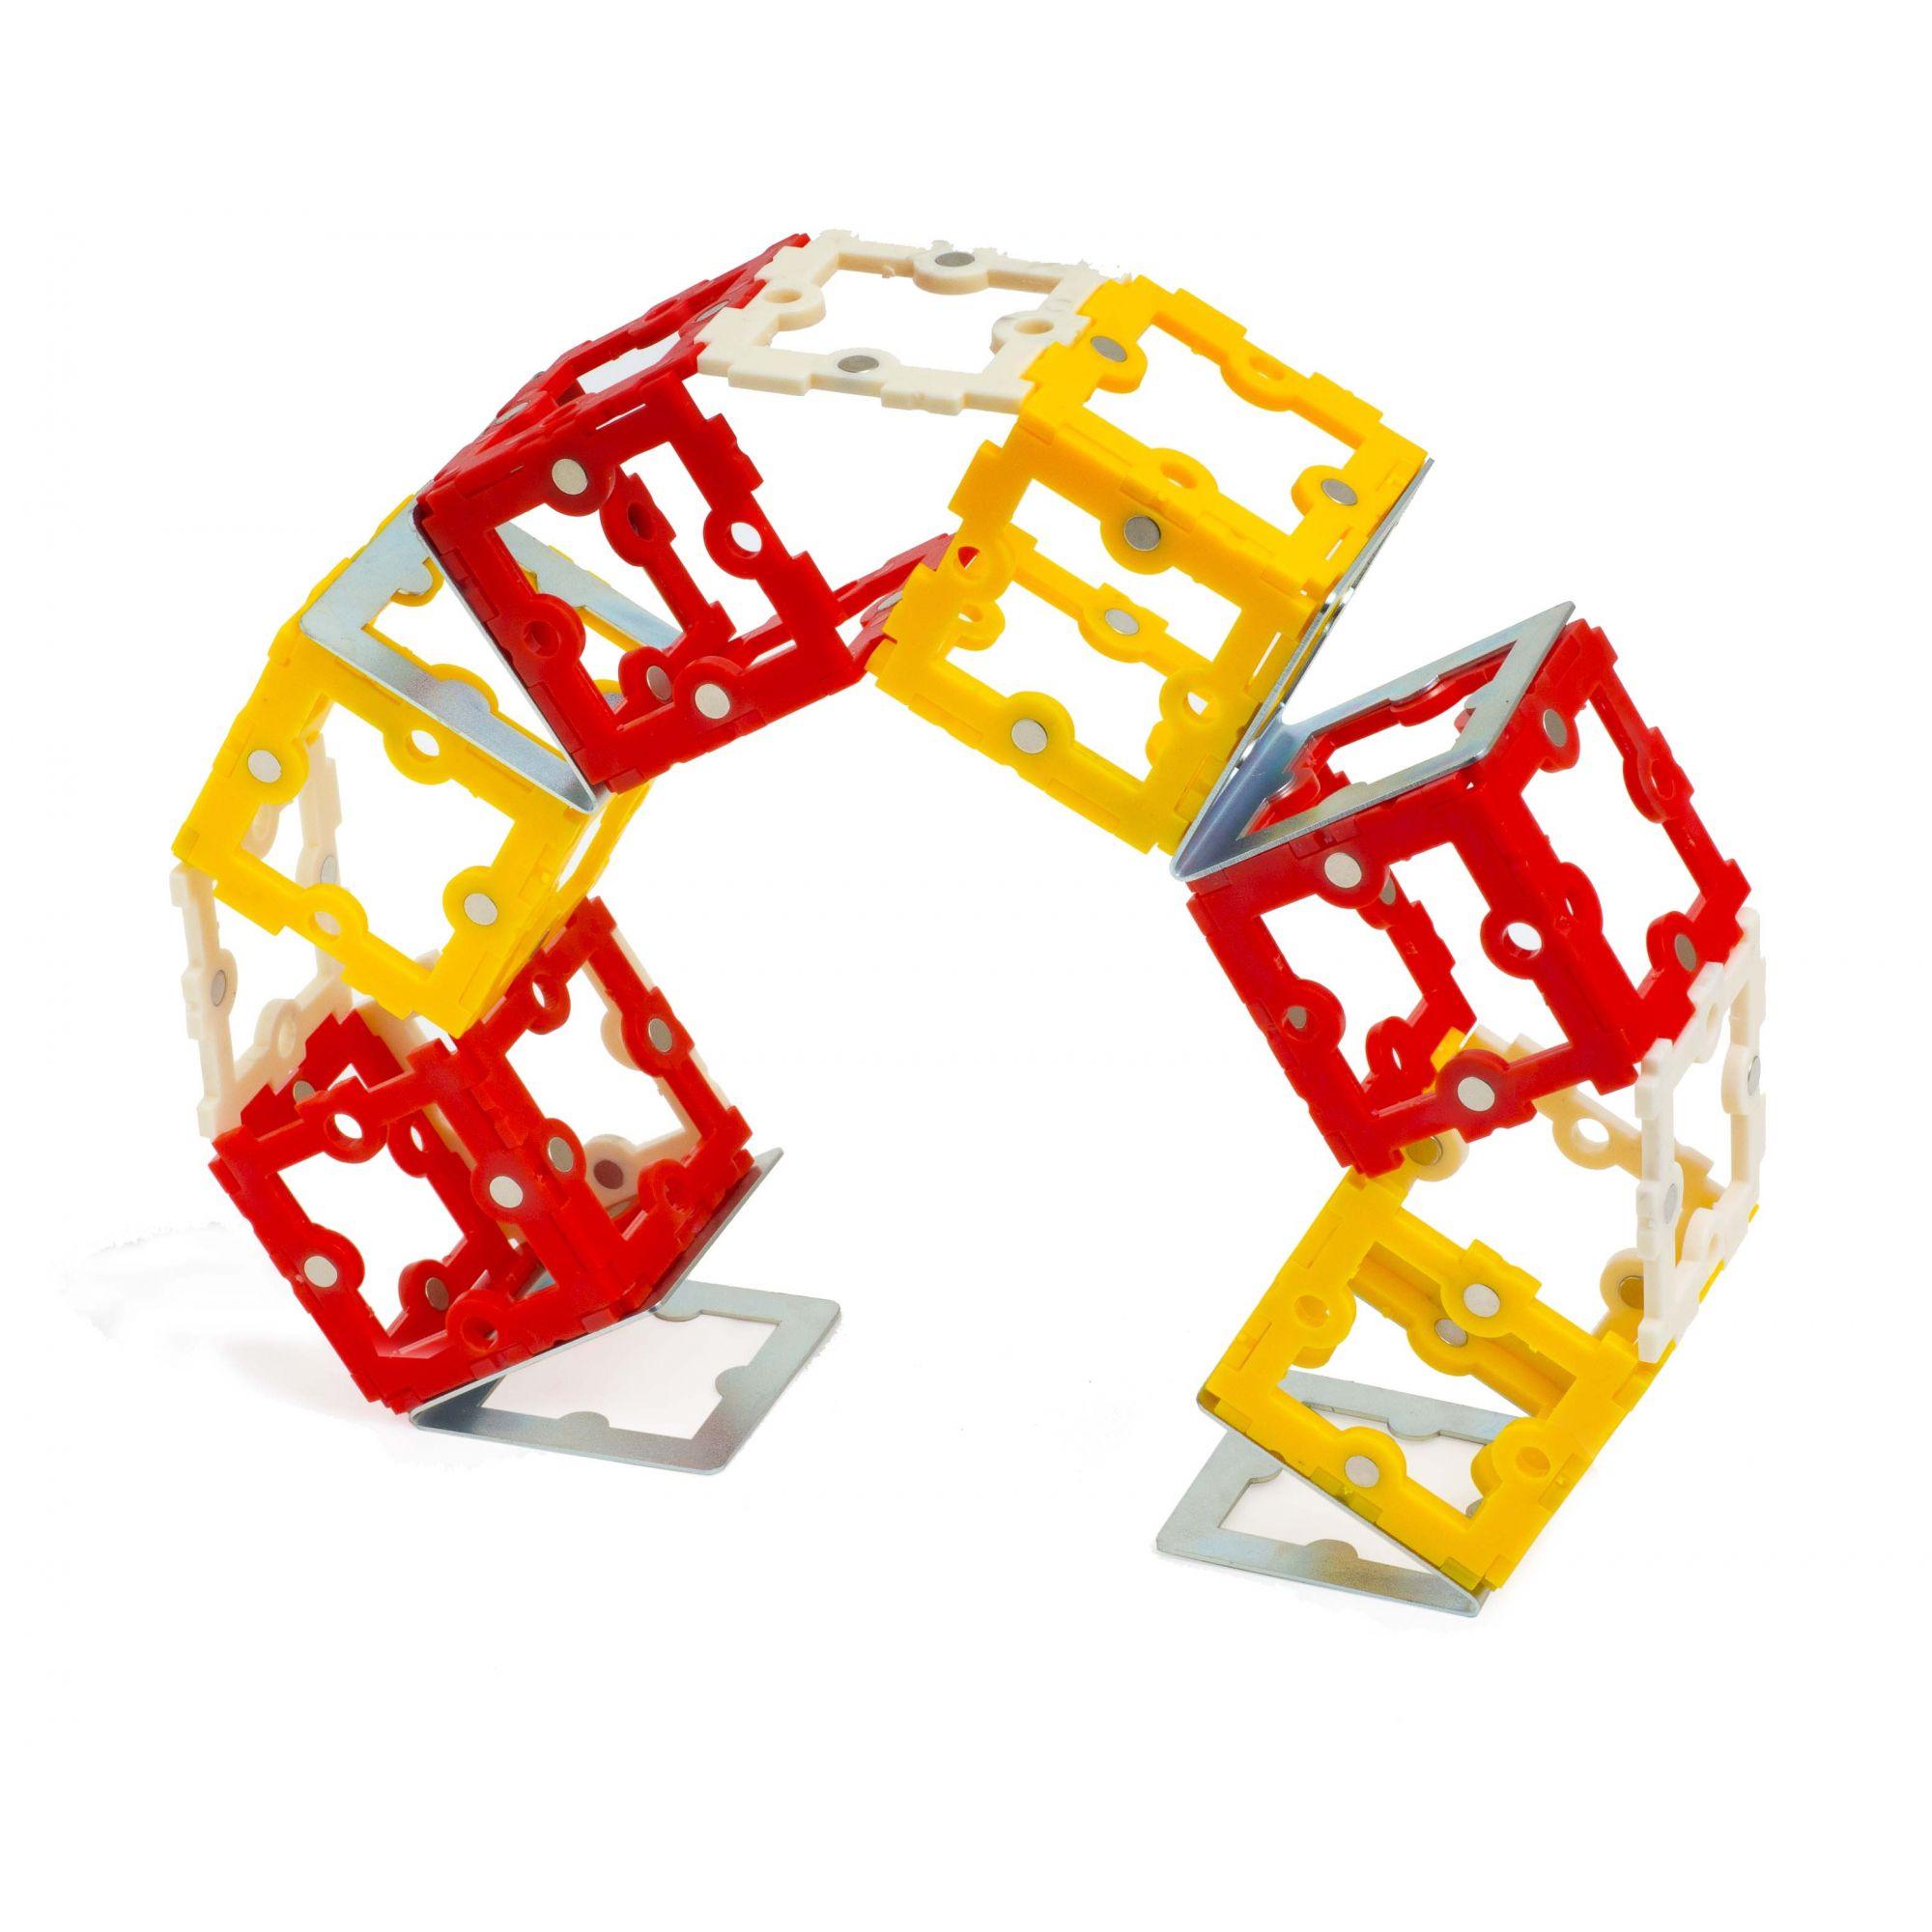 Tekton 54 Blocos de Montagem Magnetizados STEM TOY  - Place Games